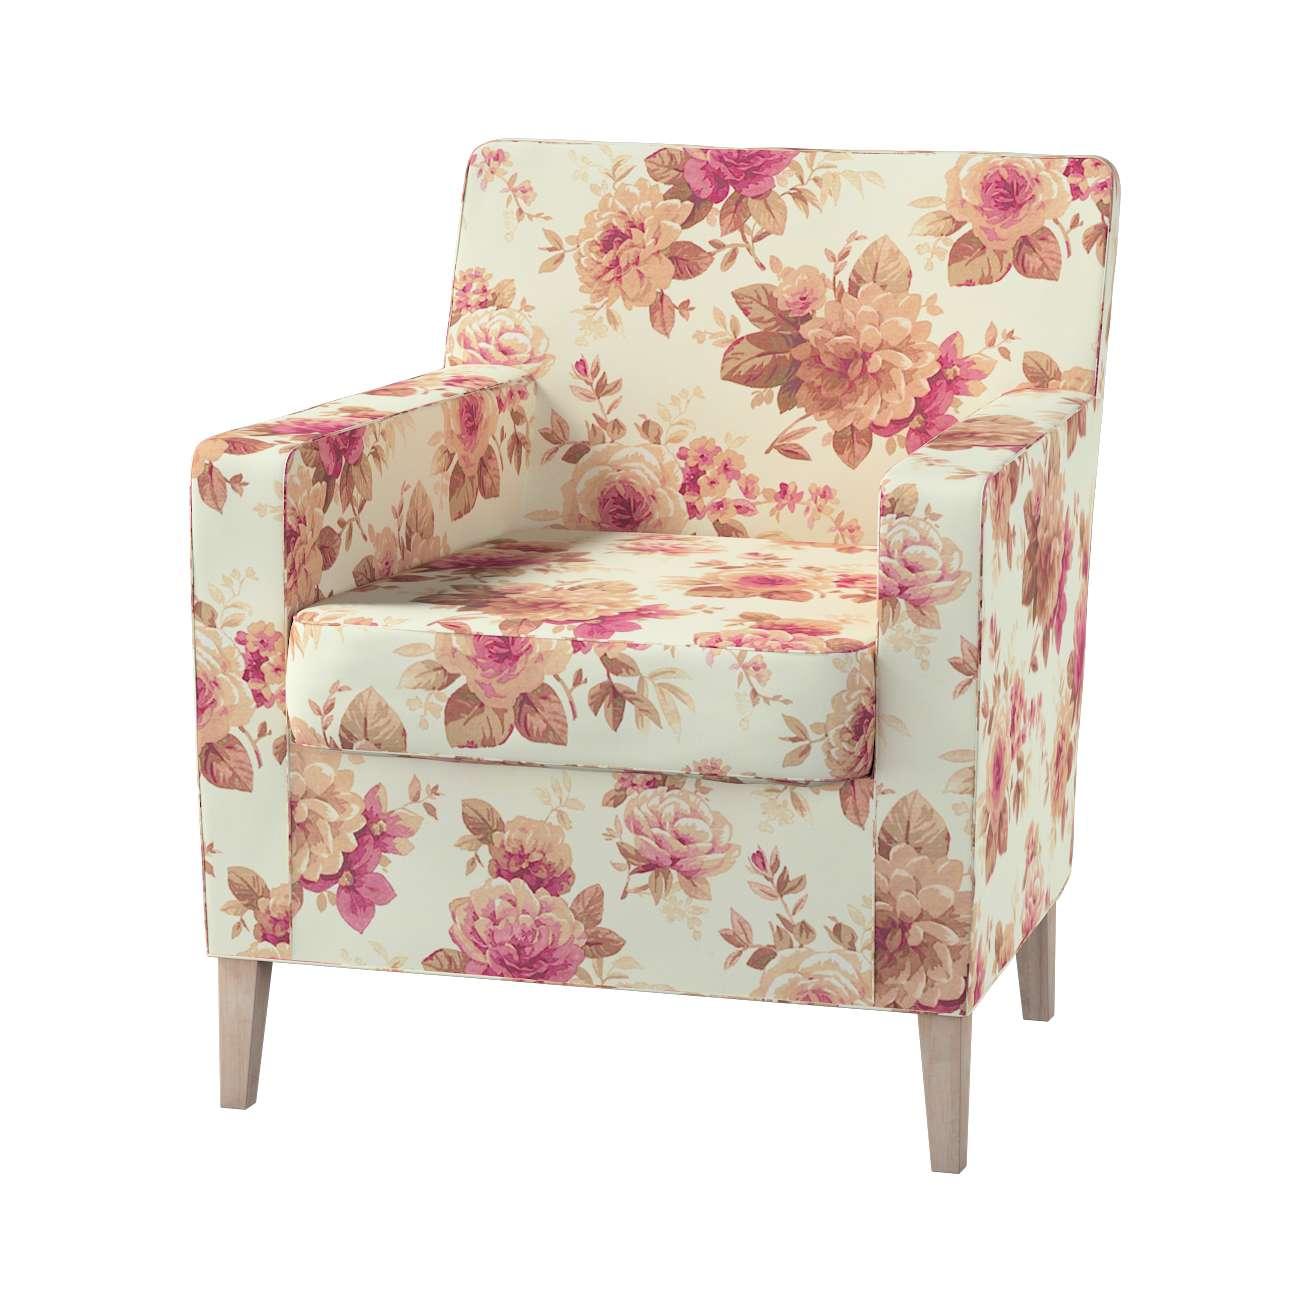 Pokrowiec na fotel Karlstad Fotel  Karlstad w kolekcji Mirella, tkanina: 141-06